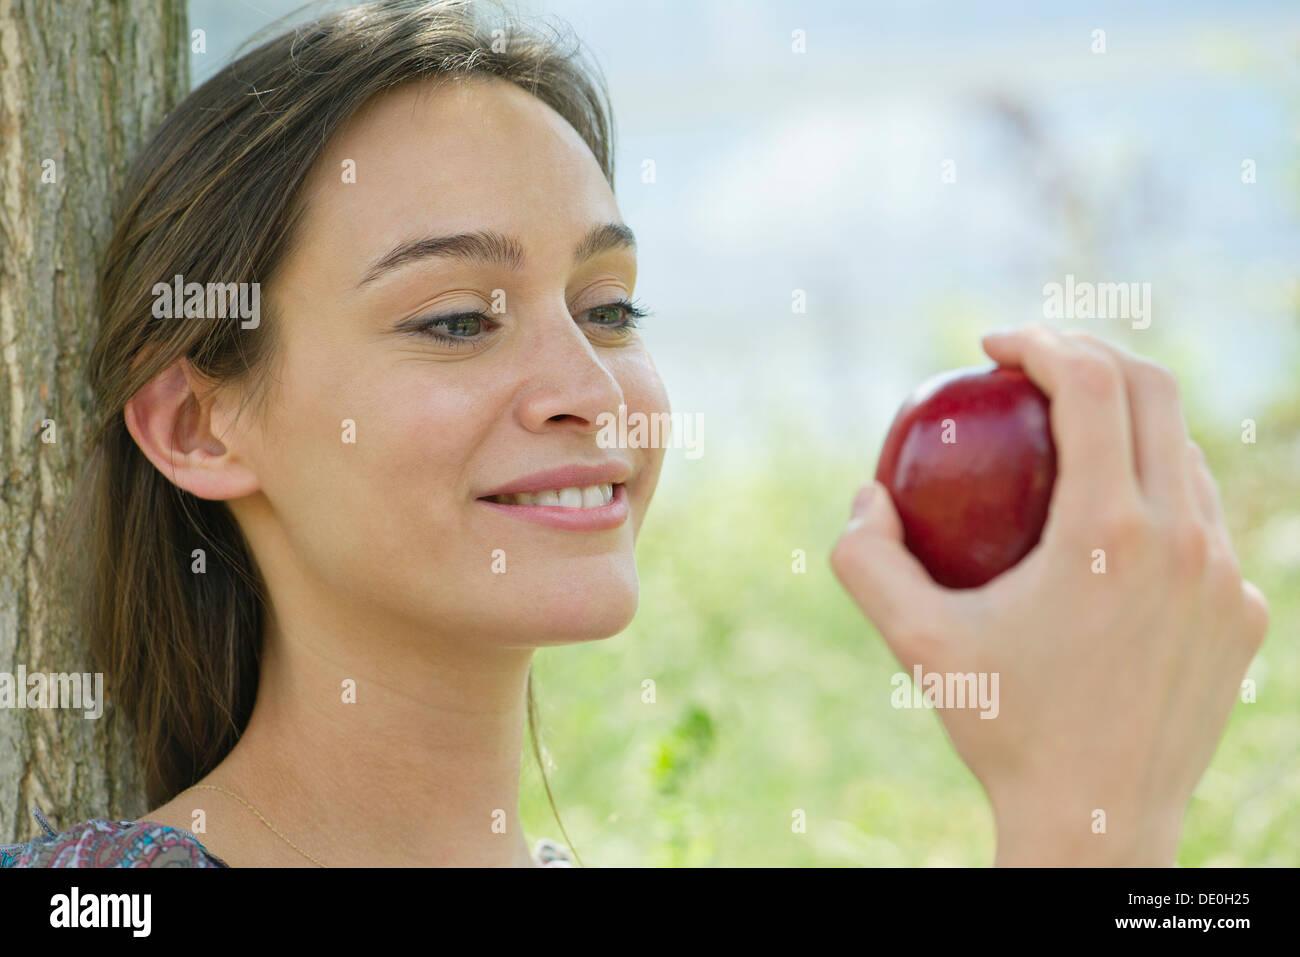 Frau sitzt im Freien mit Apfel Stockbild